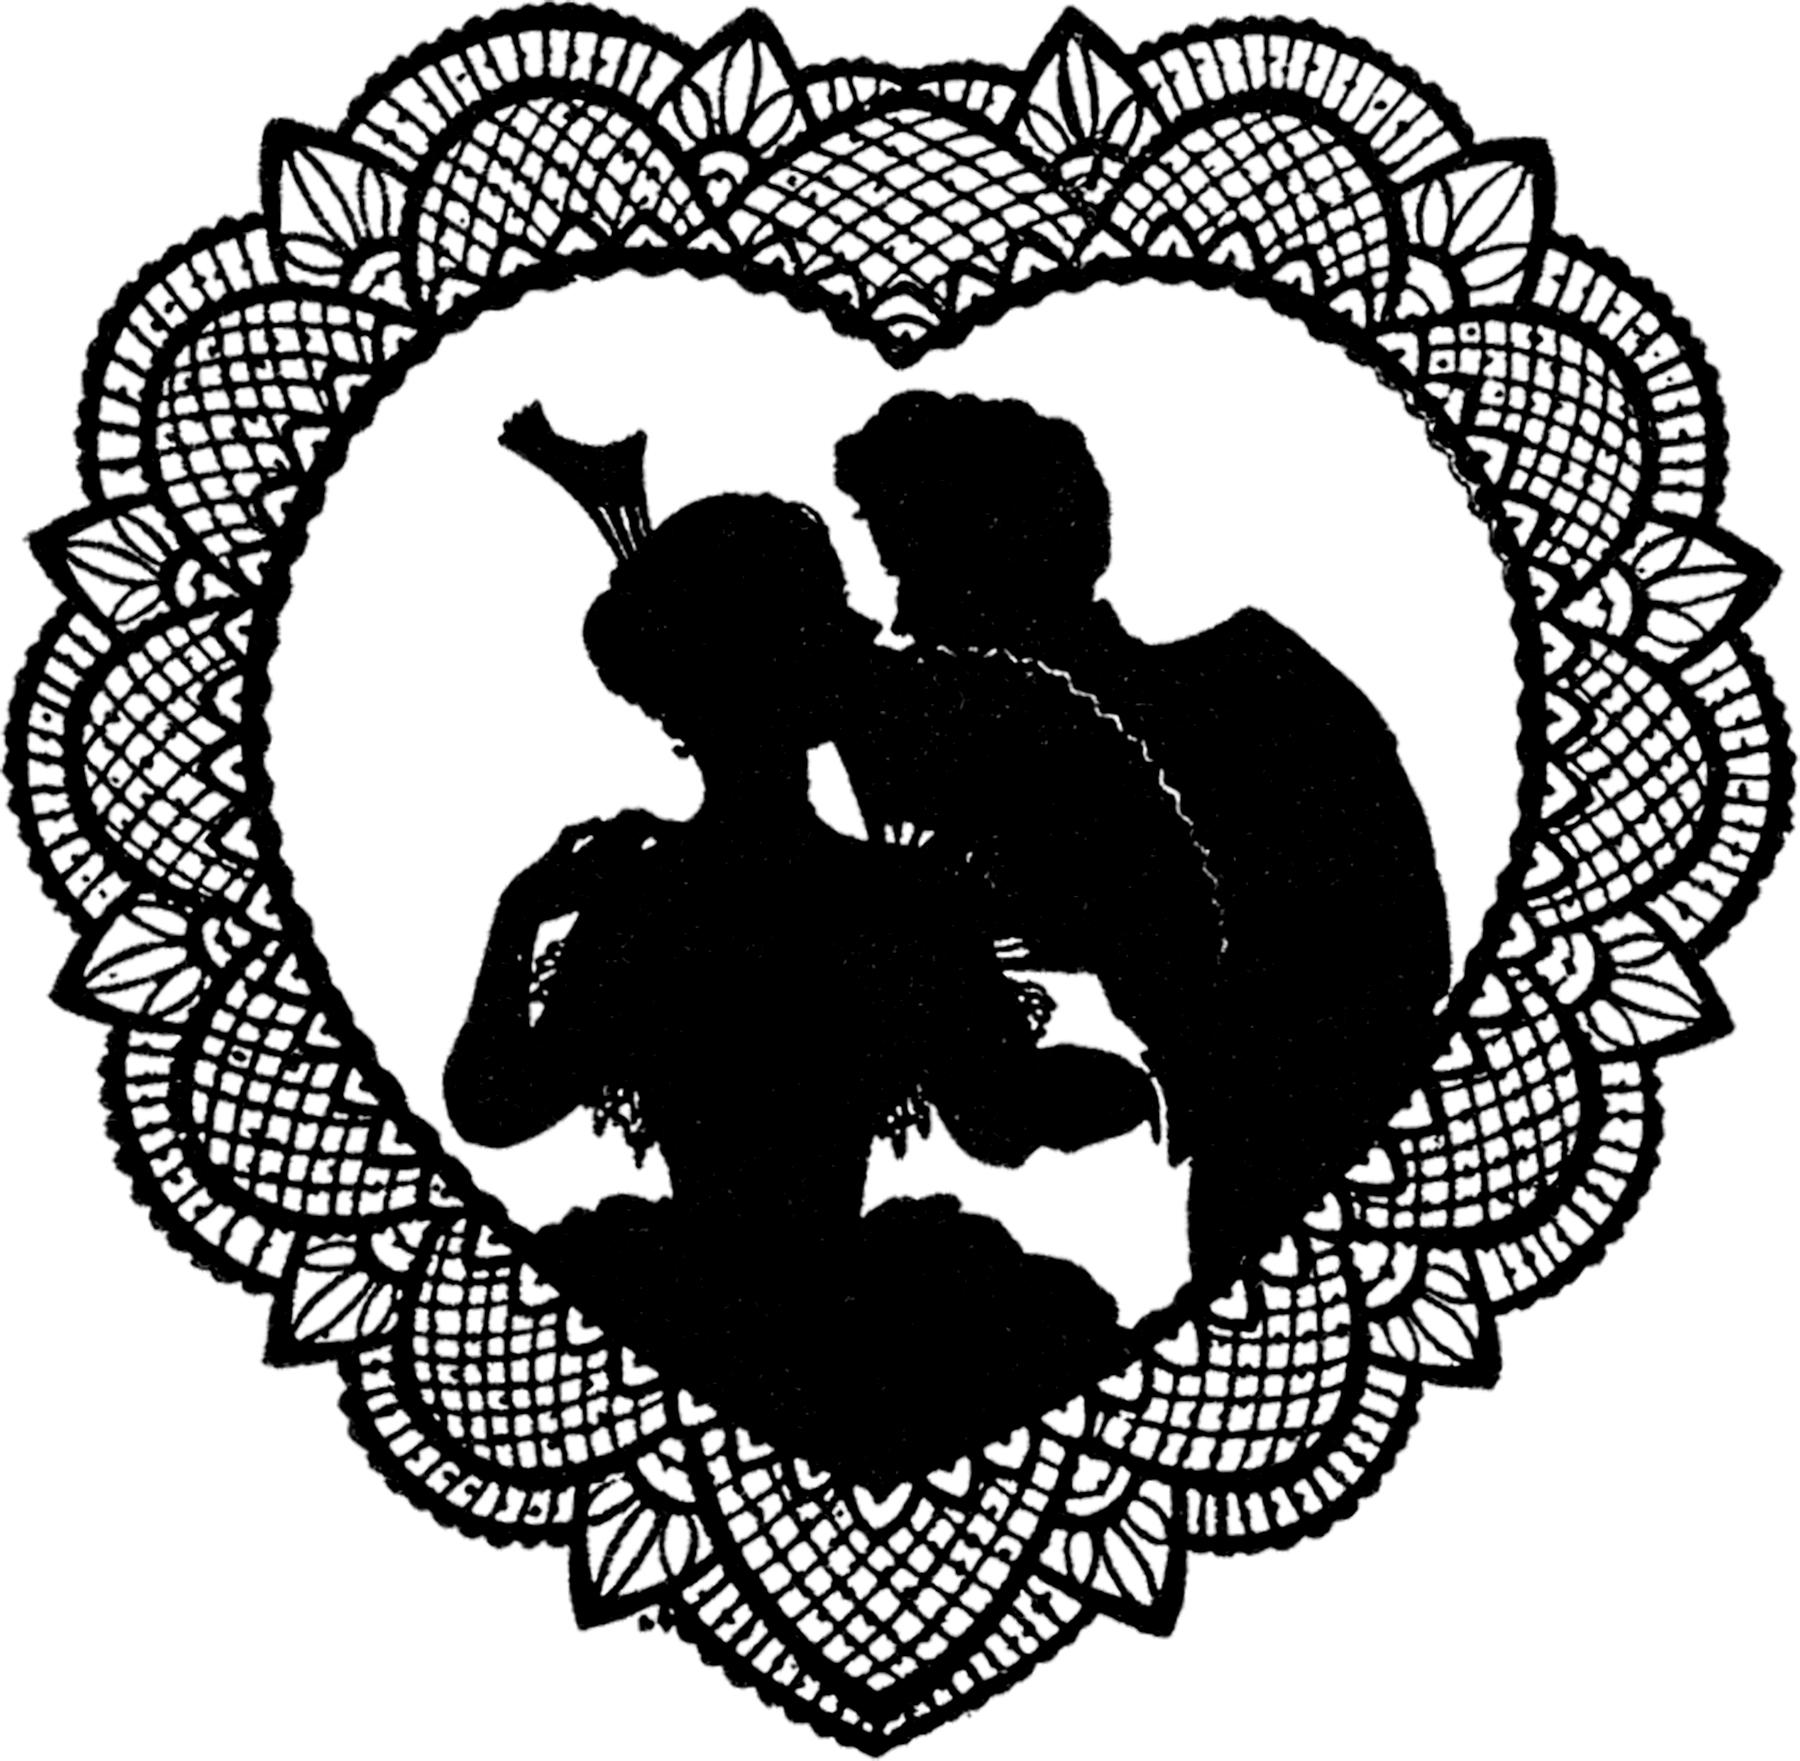 Valentine silhouette clipart clipart transparent 12 Vintage Valentine Silhouettes! - The Graphics Fairy clipart transparent